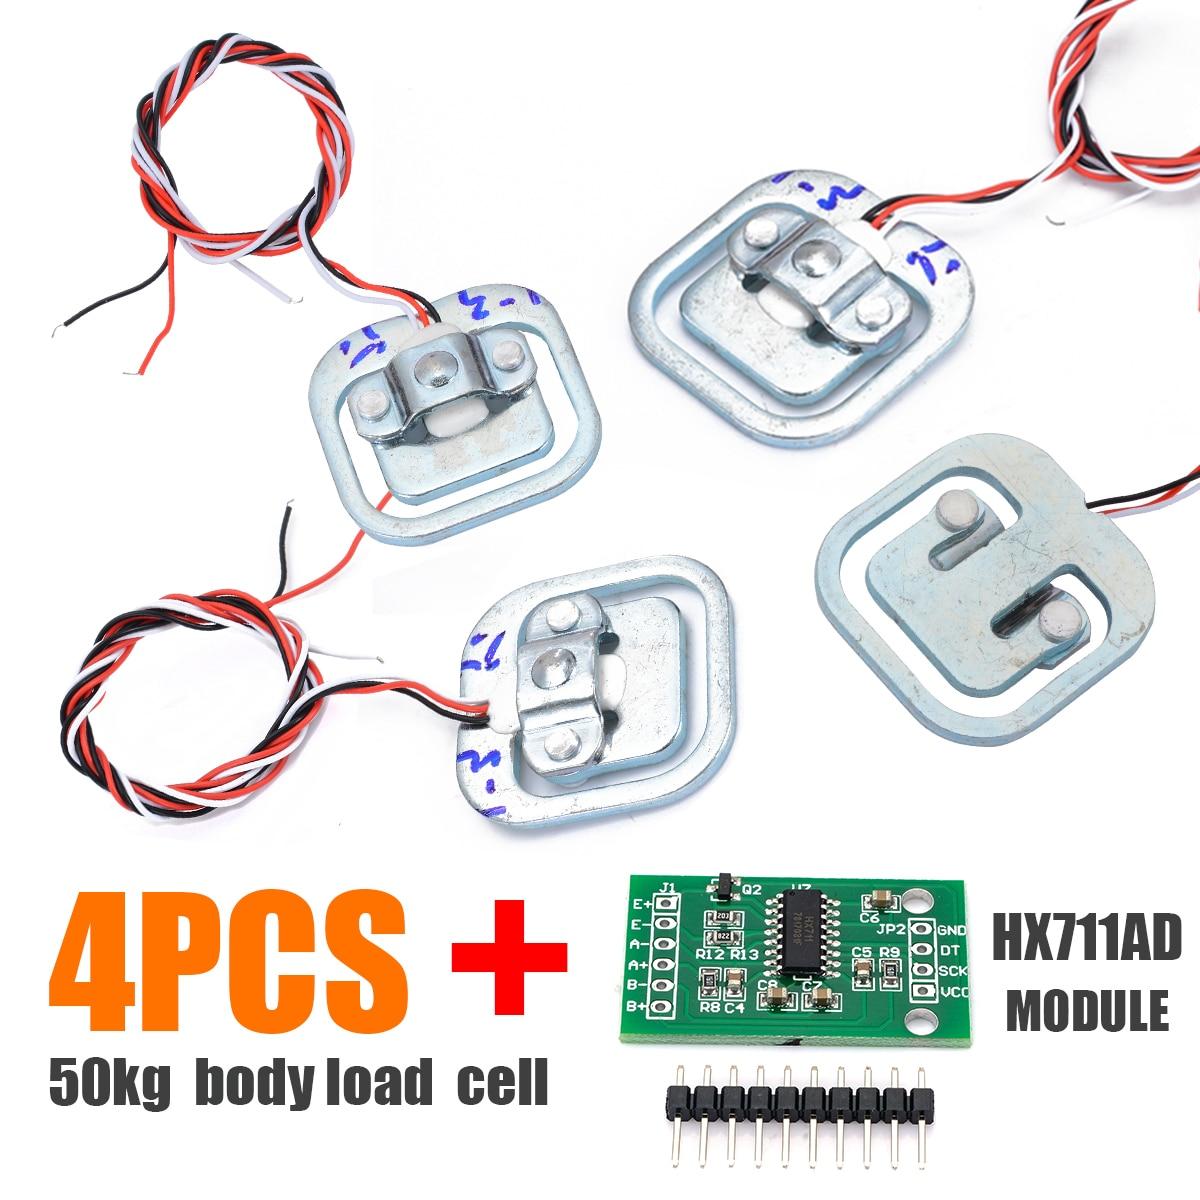 New 4pcs 50KG Human Scale Body Load Cell Resistance Strain Weight Sensor + HX711 AD Module Pressure Sensors Measurement Tools